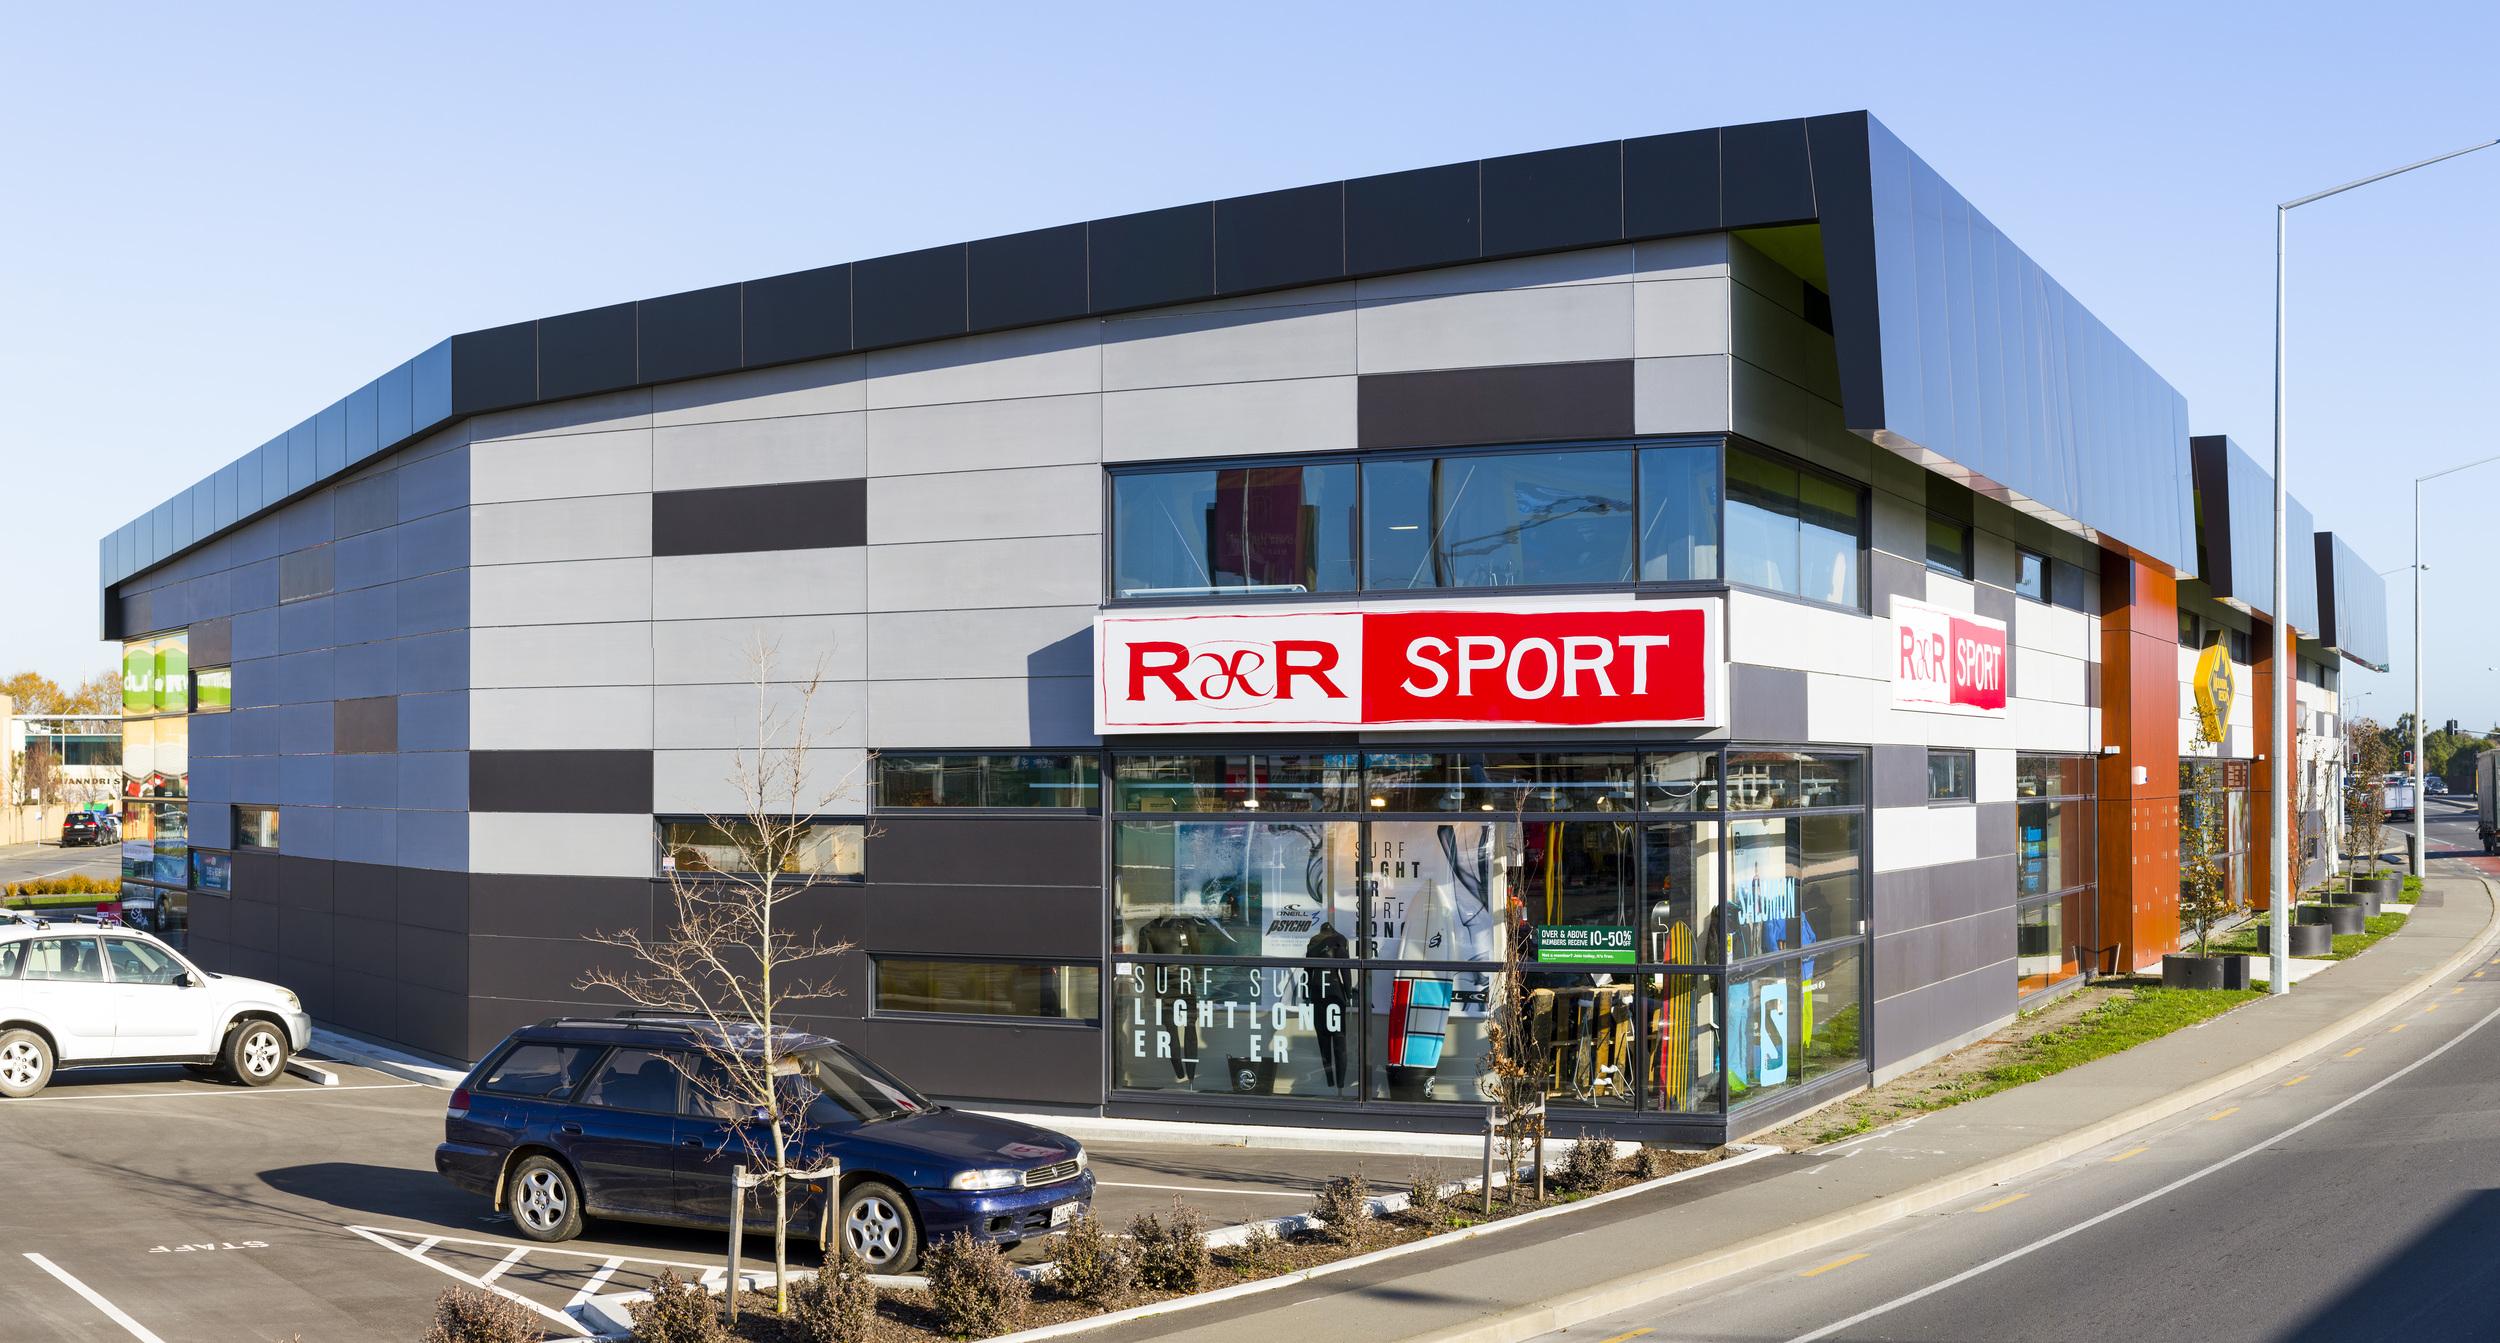 R&R Sport / Mountain Designs / Amazon - 65 Blenheim Road Retail Development, Christchurch